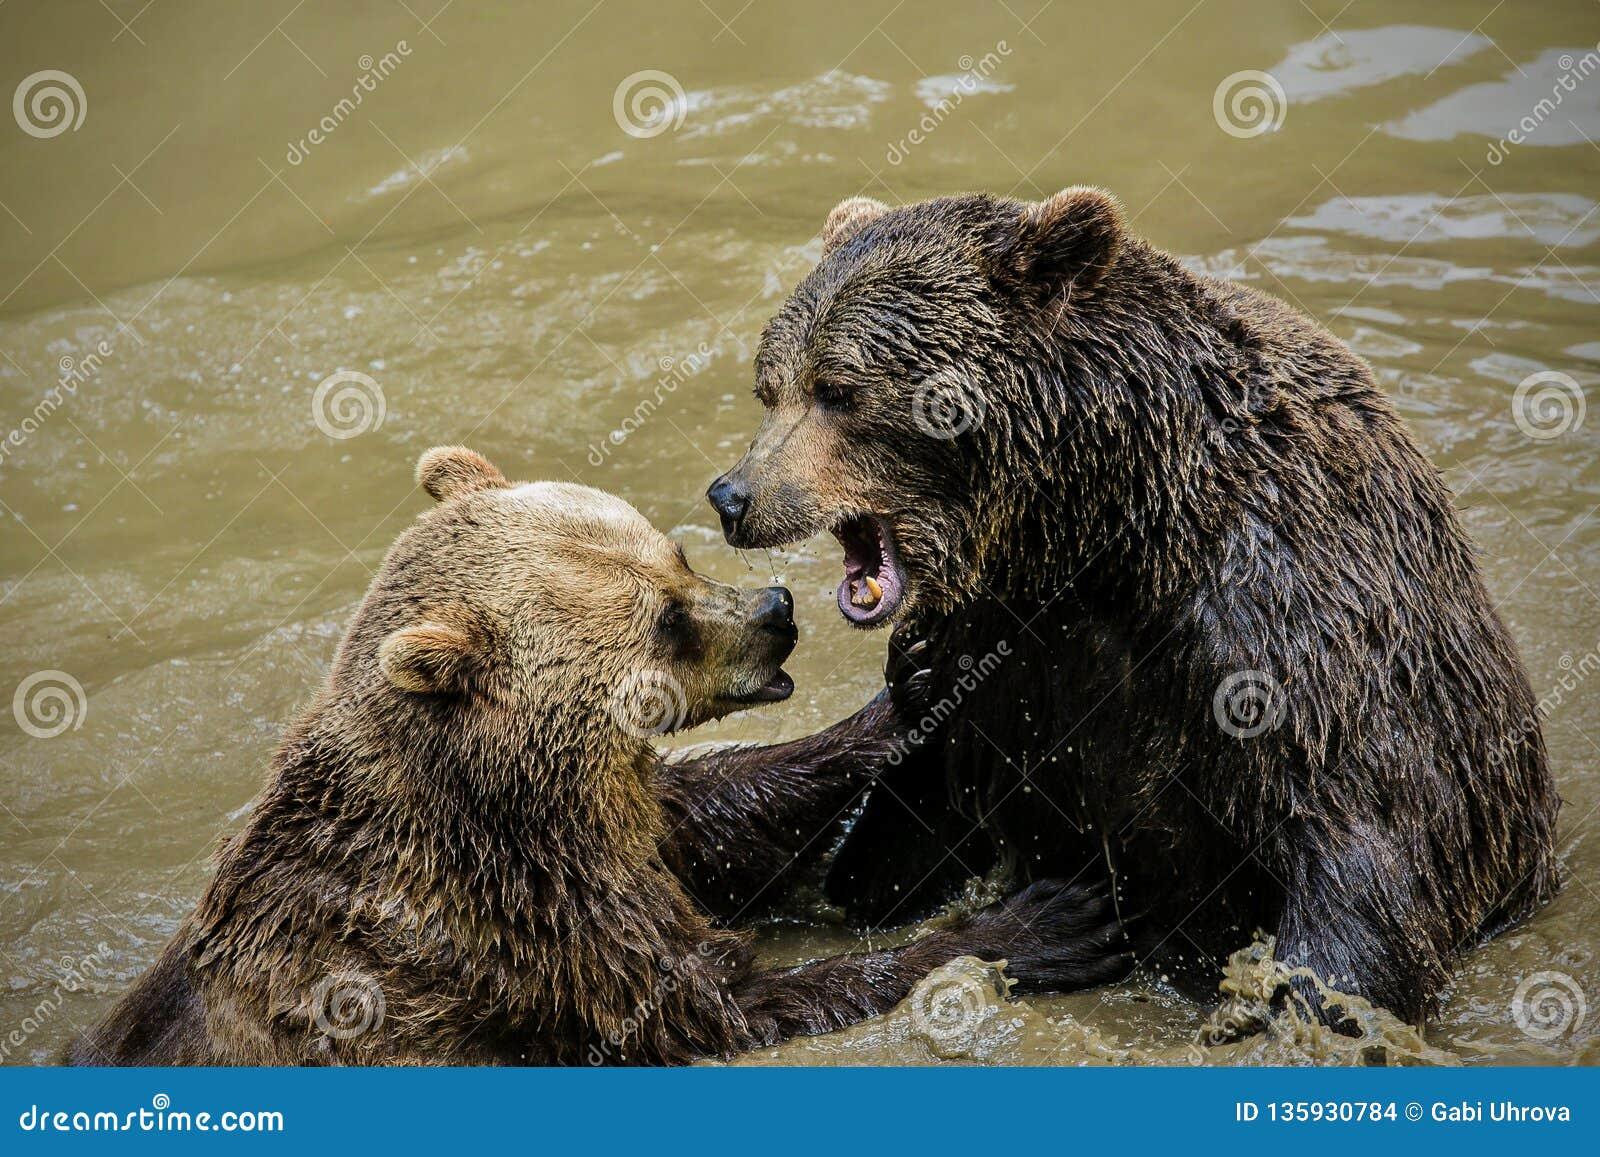 Two adult brown bears, Ursus arctos, messing around in muddy water